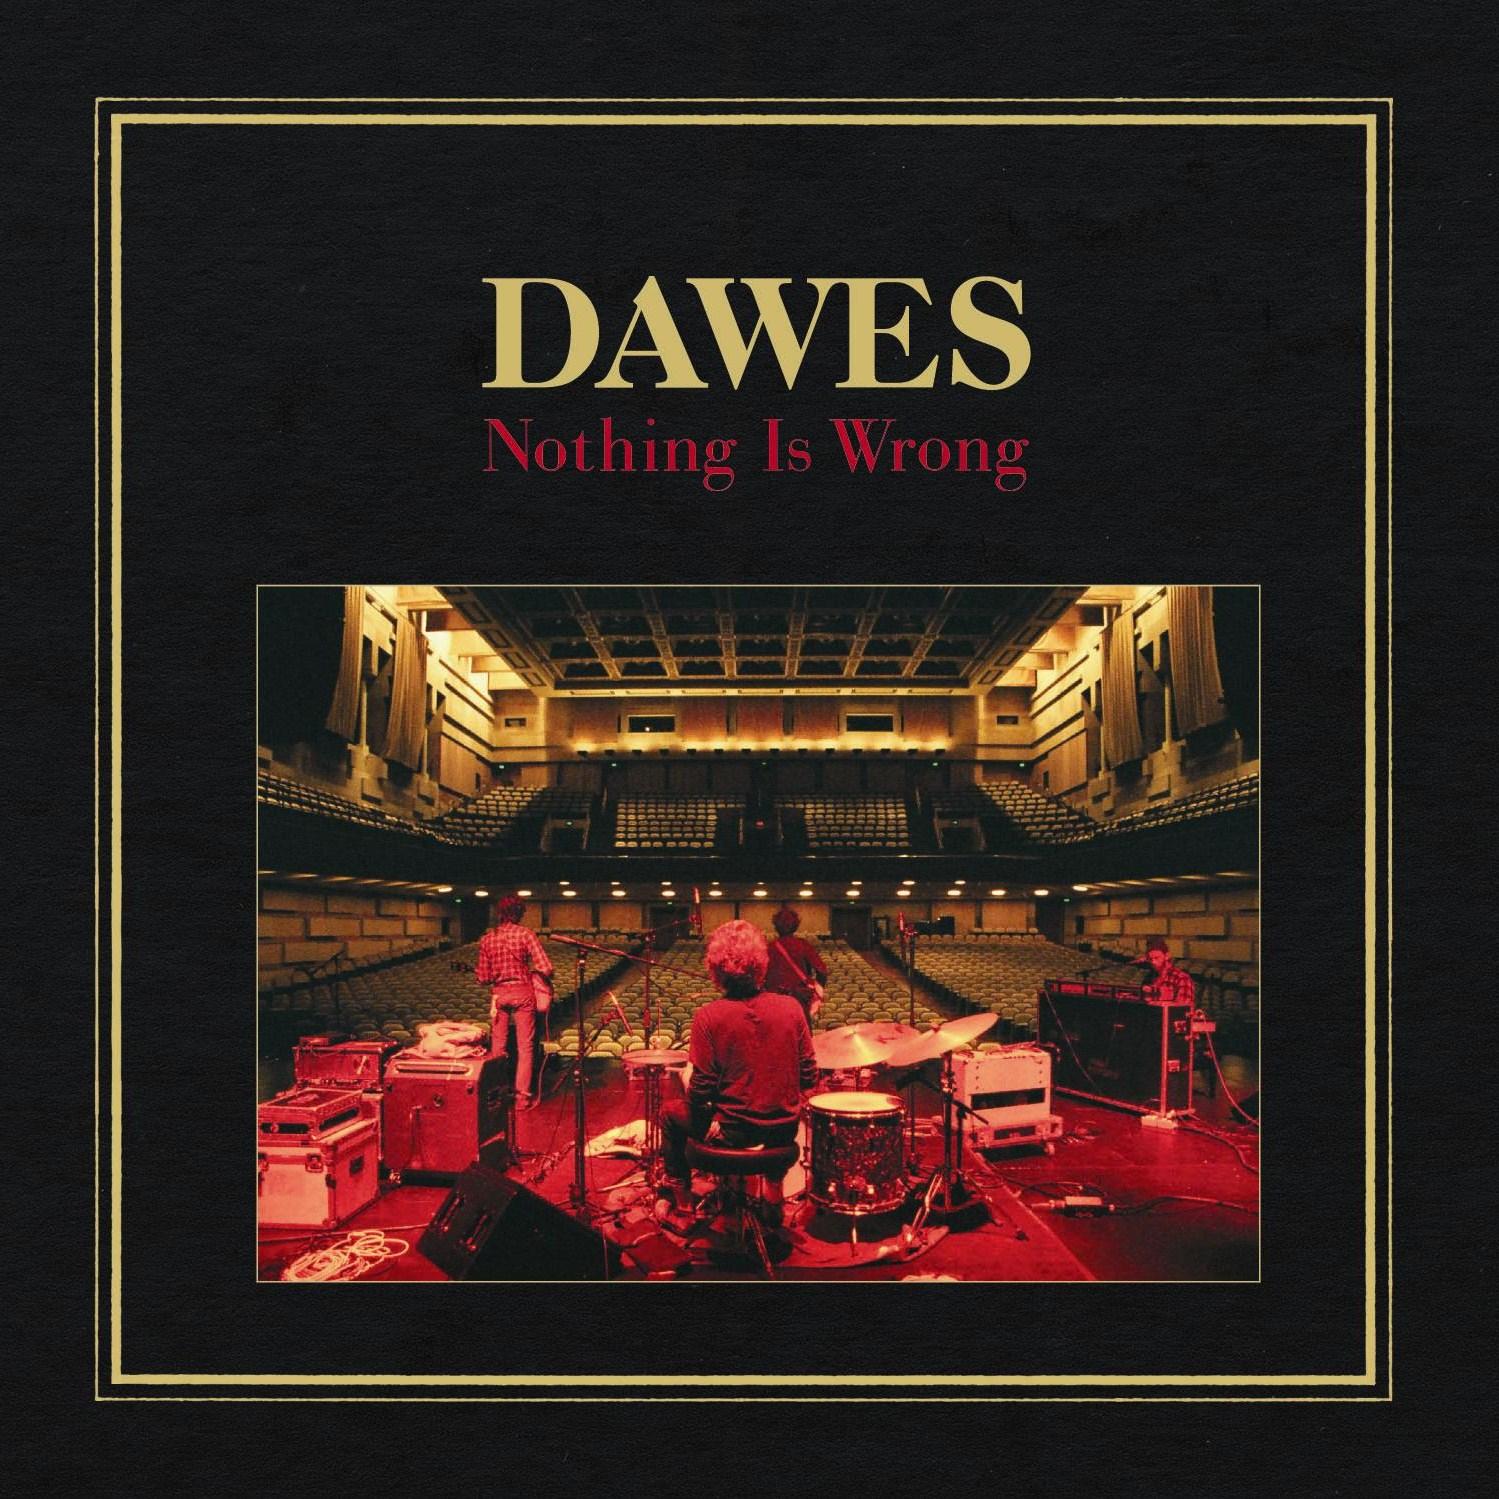 Dawes Announces New Album, Tour Dates